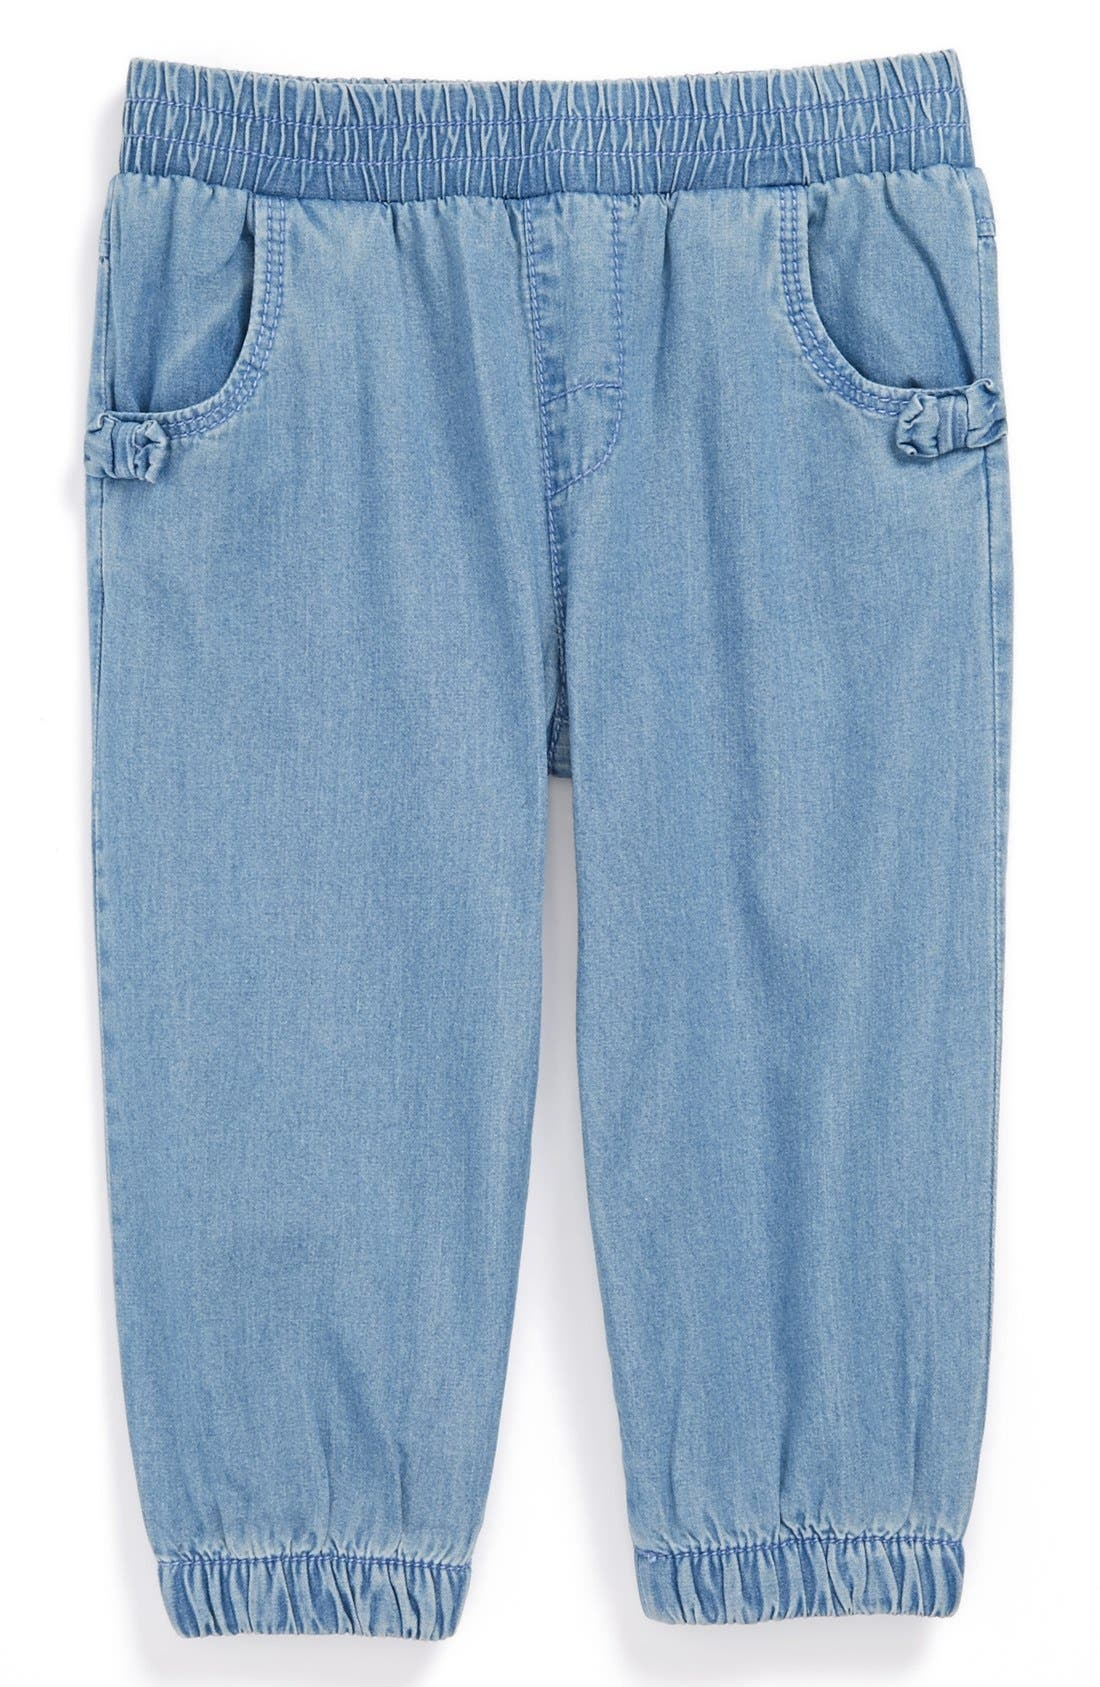 Alternate Image 1 Selected - Nordstrom Baby Denim Pants (Baby Girls)